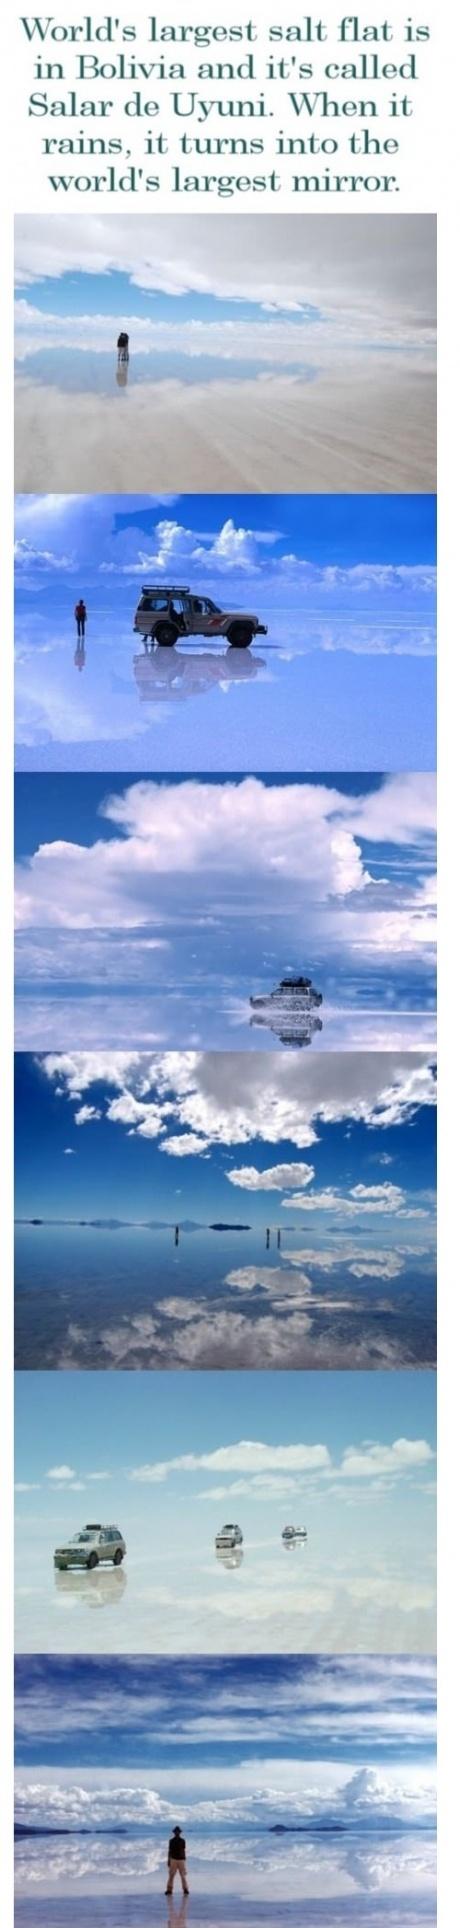 Meanwhile in Bolivia, called salar de uyuni, when it rains, worlds larget mirror, salt flat